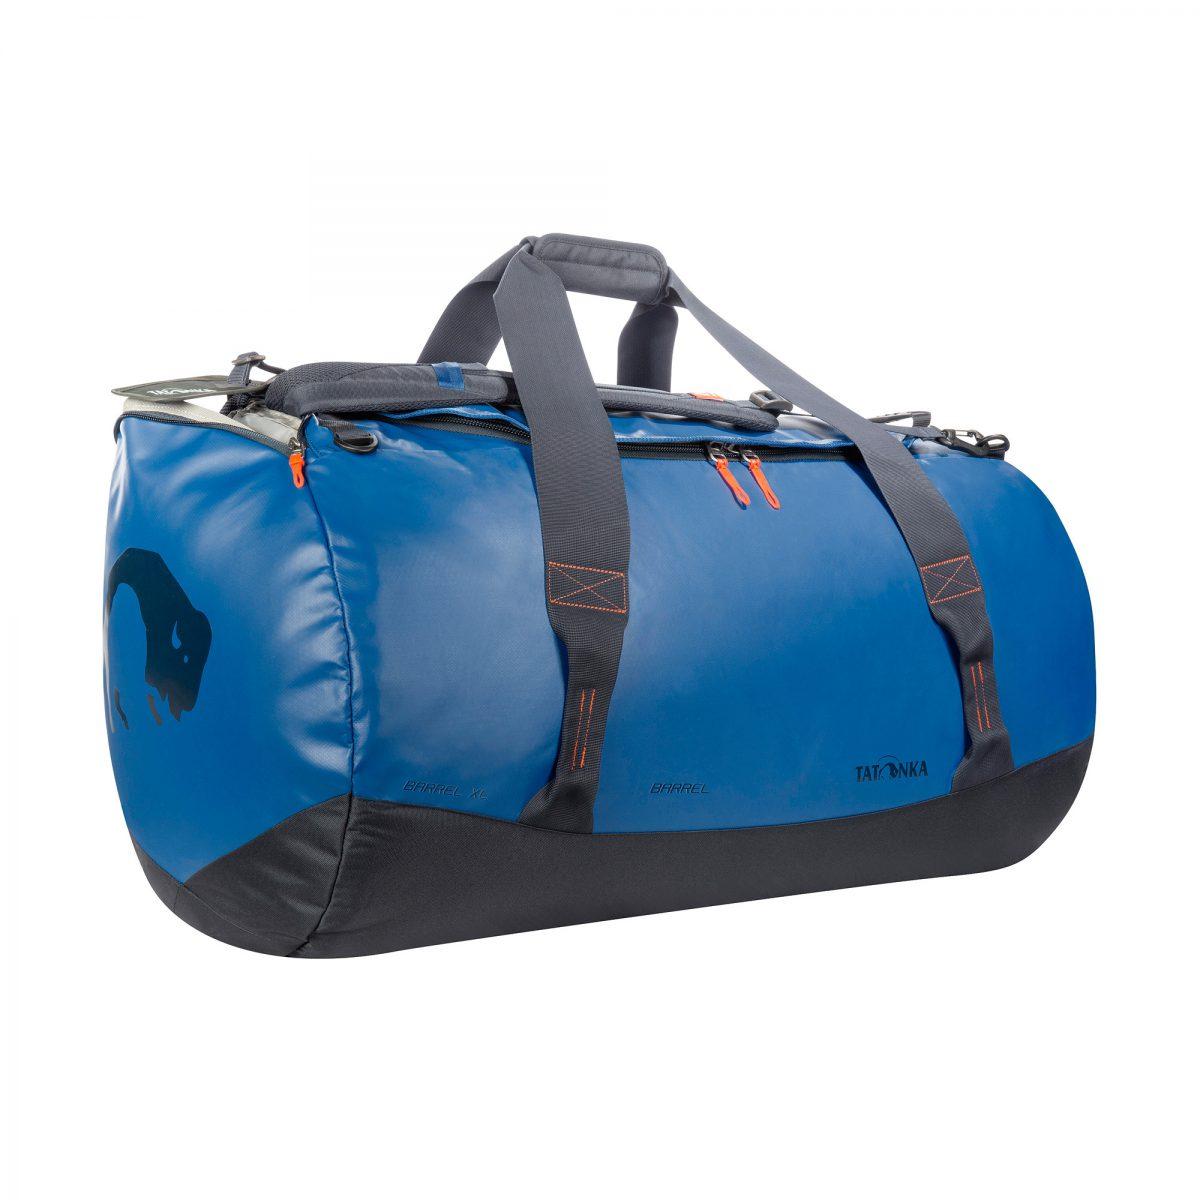 Picture of Tatonka Barrel XL Travel Bag - blue